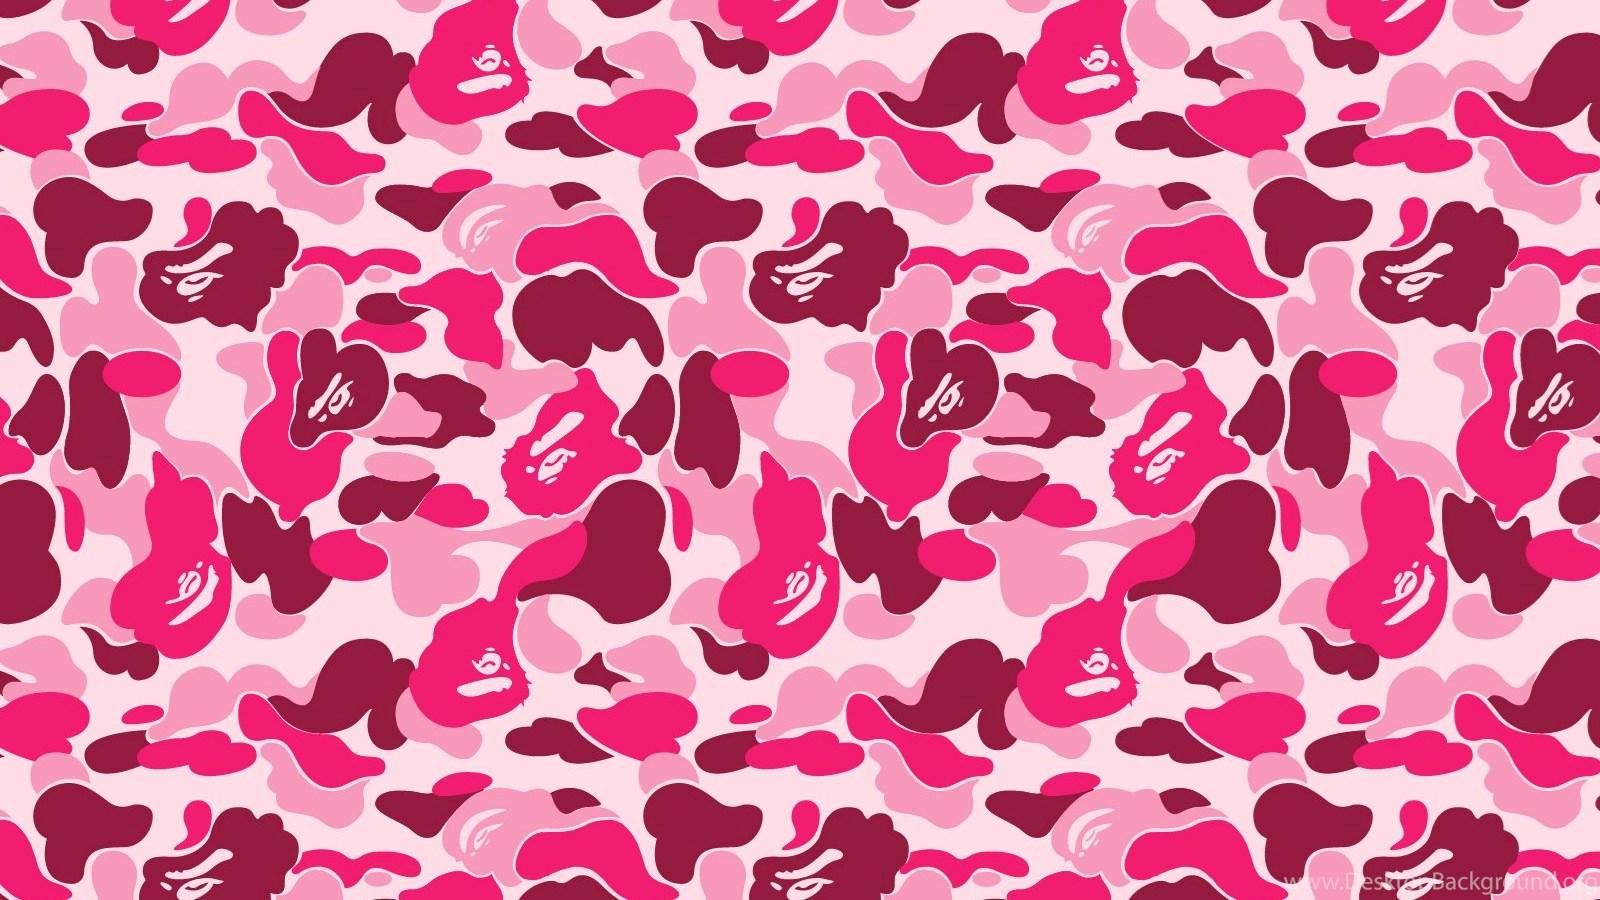 Supreme Wallpaper Iphone X 1000 Images About Bape Camo Wallpaper Desktop Pink Jpg